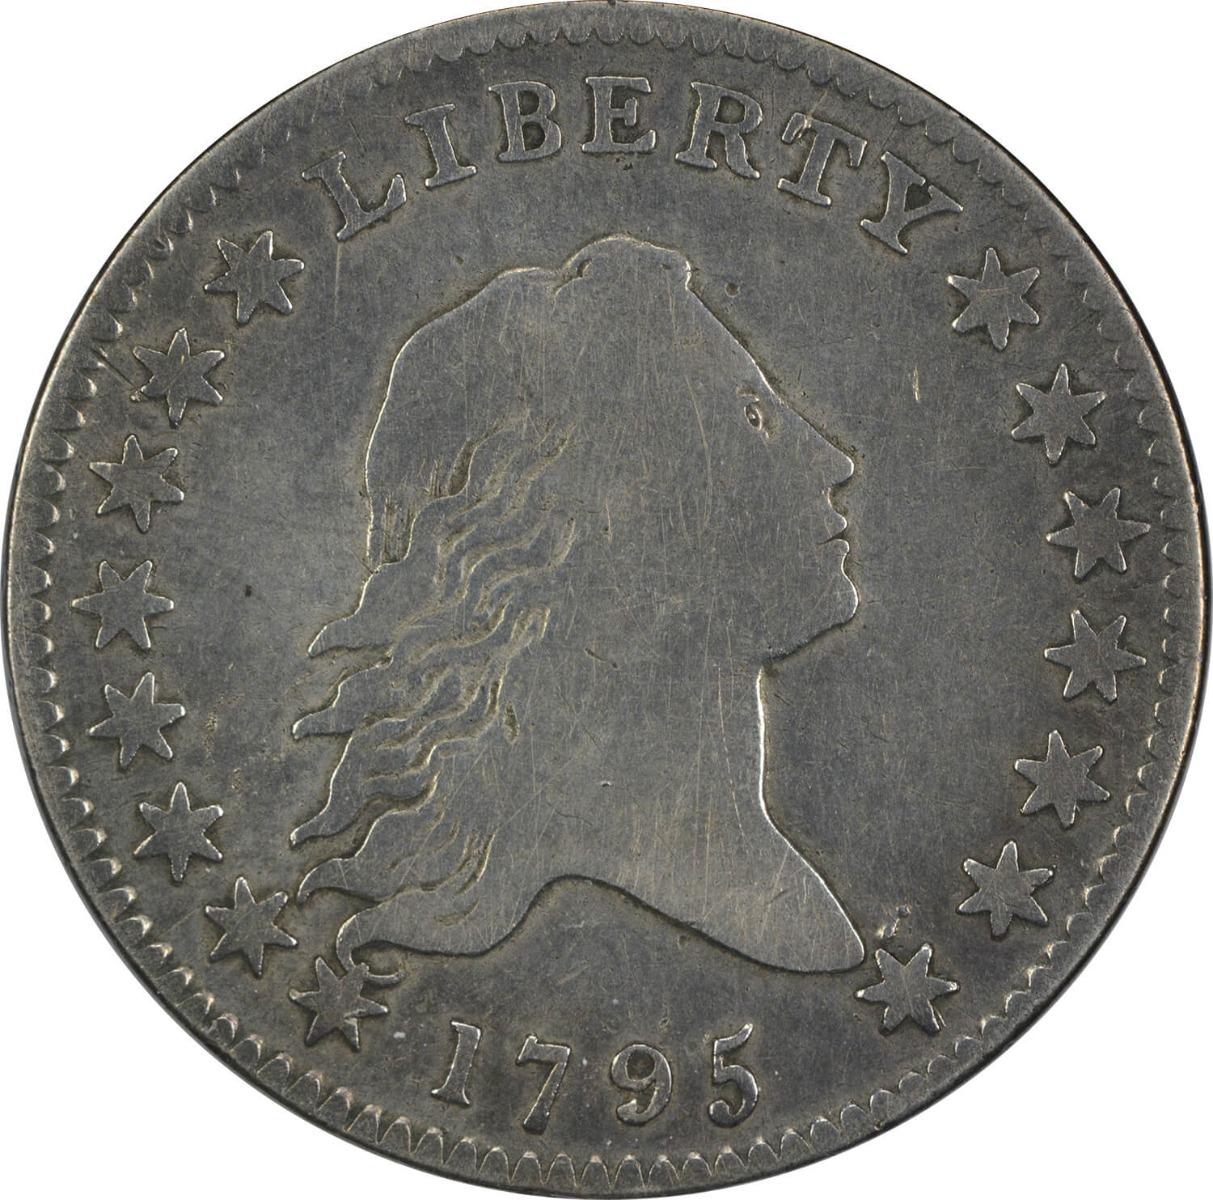 1795 Bust Half Dollar, 2 Leaves, F, Uncertified